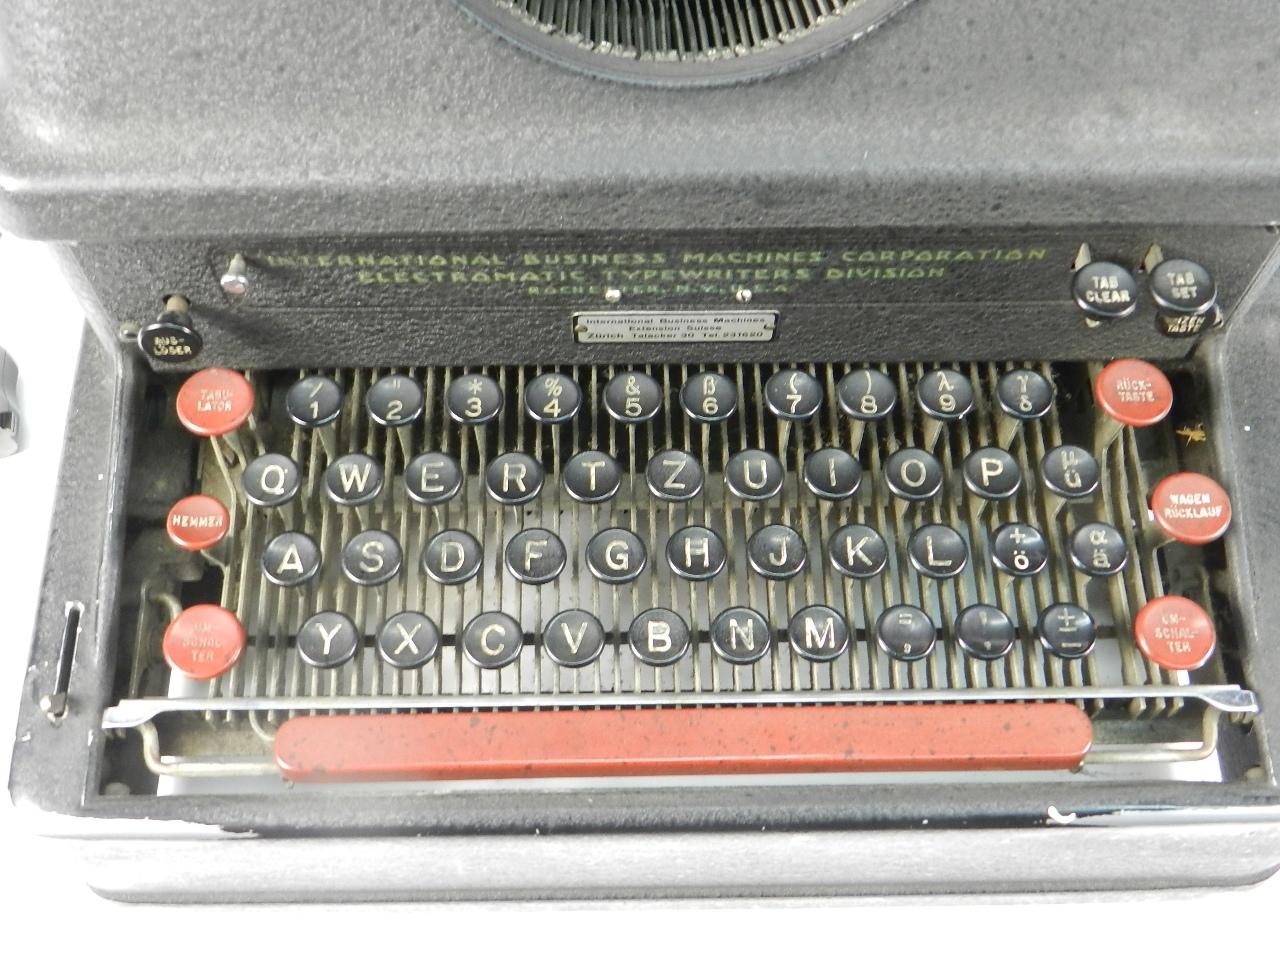 Imagen IBM ELECTROMATIC AÑO 1935 40290